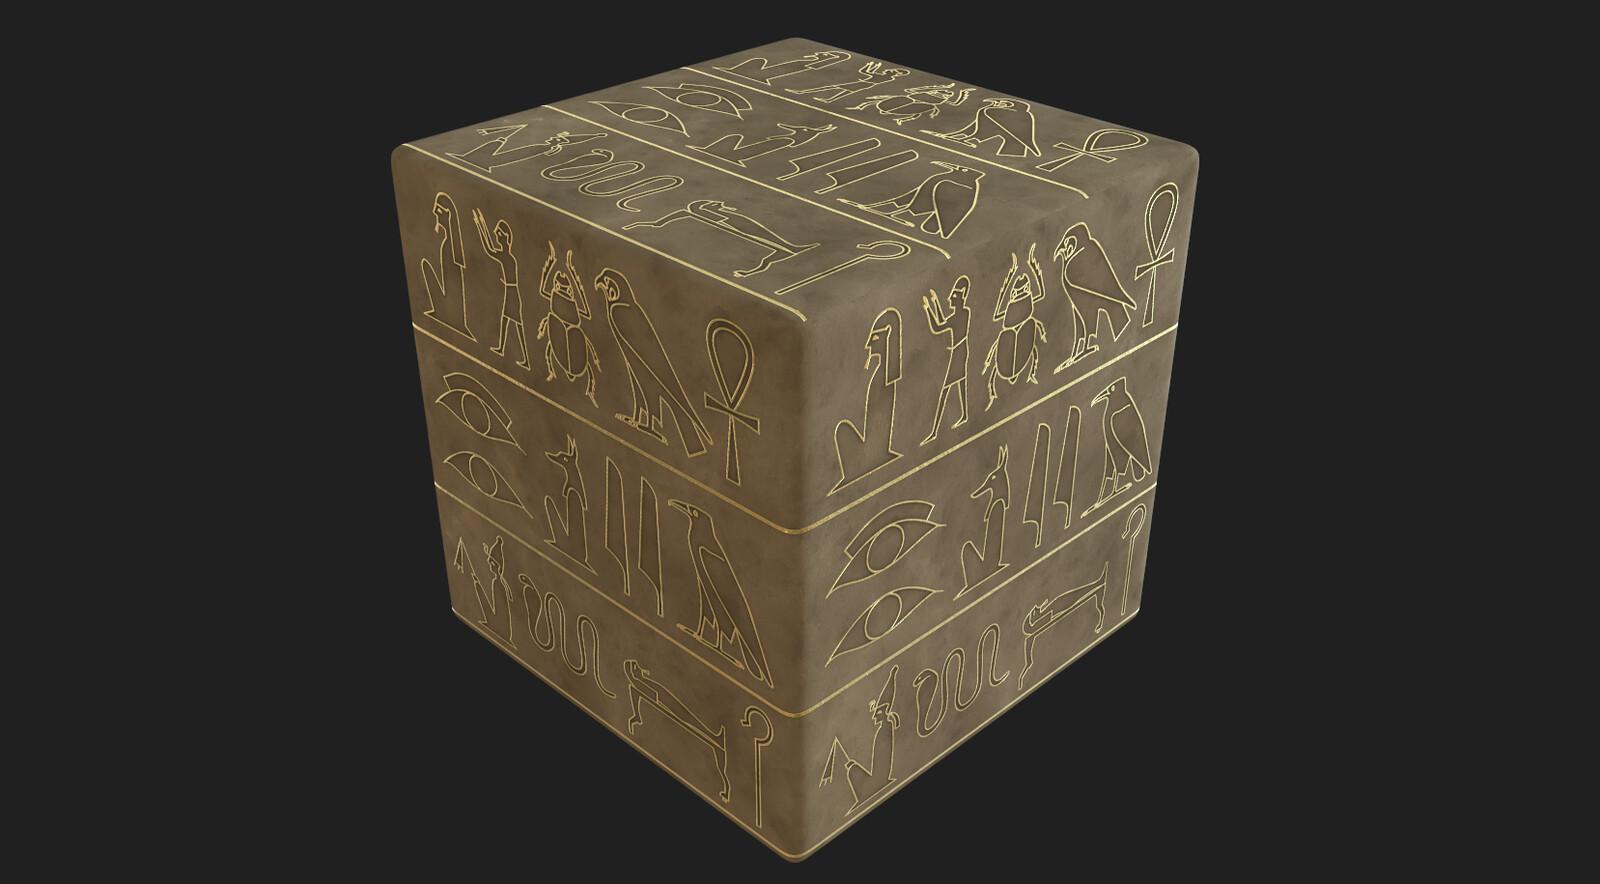 Hieroglyph material